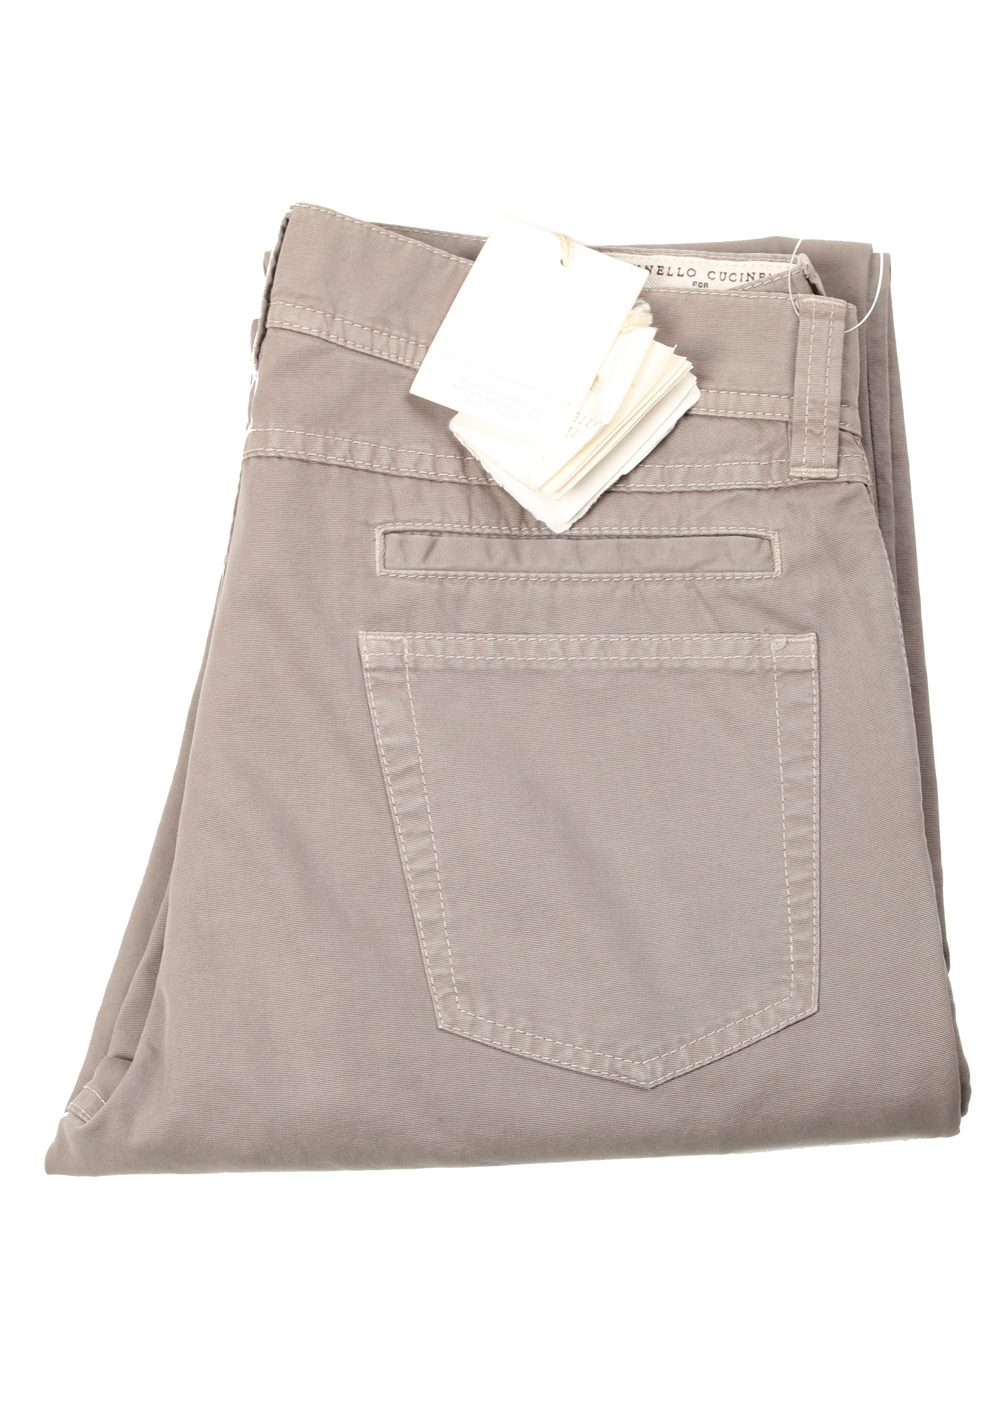 Brunello Cucinelli Beige Trousers Size 46 / 30 U.S. | Costume Limité